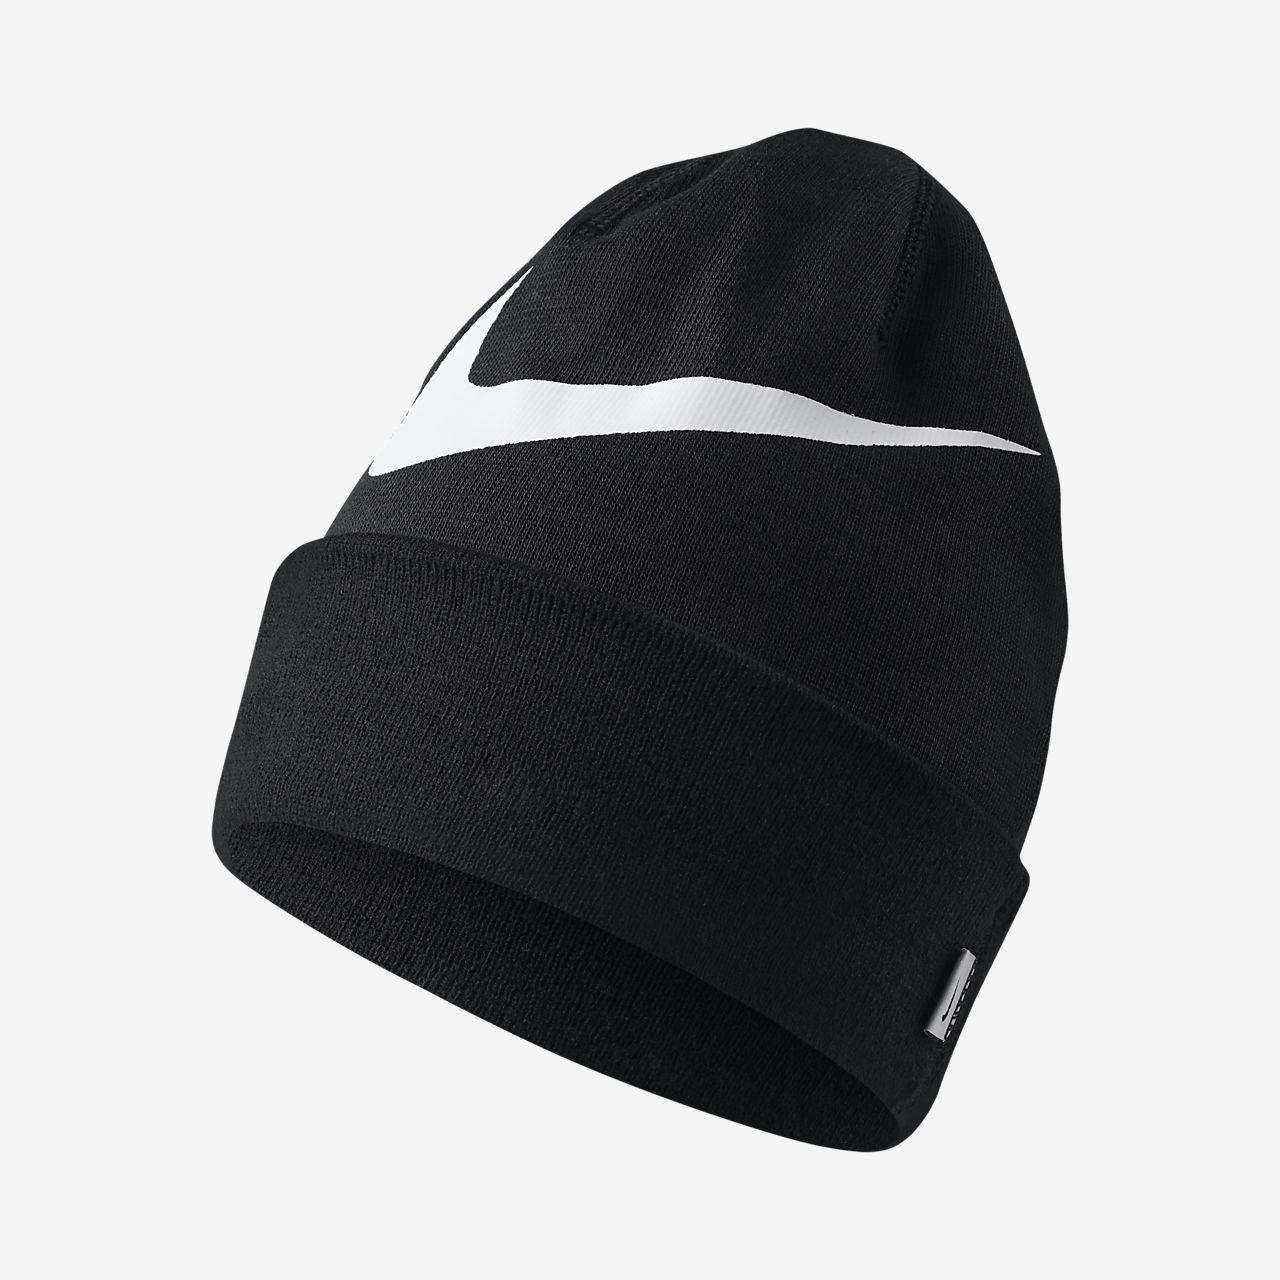 237245d606940 Nike Swoosh Cuffed Training Knit Hat. Nike.com NO